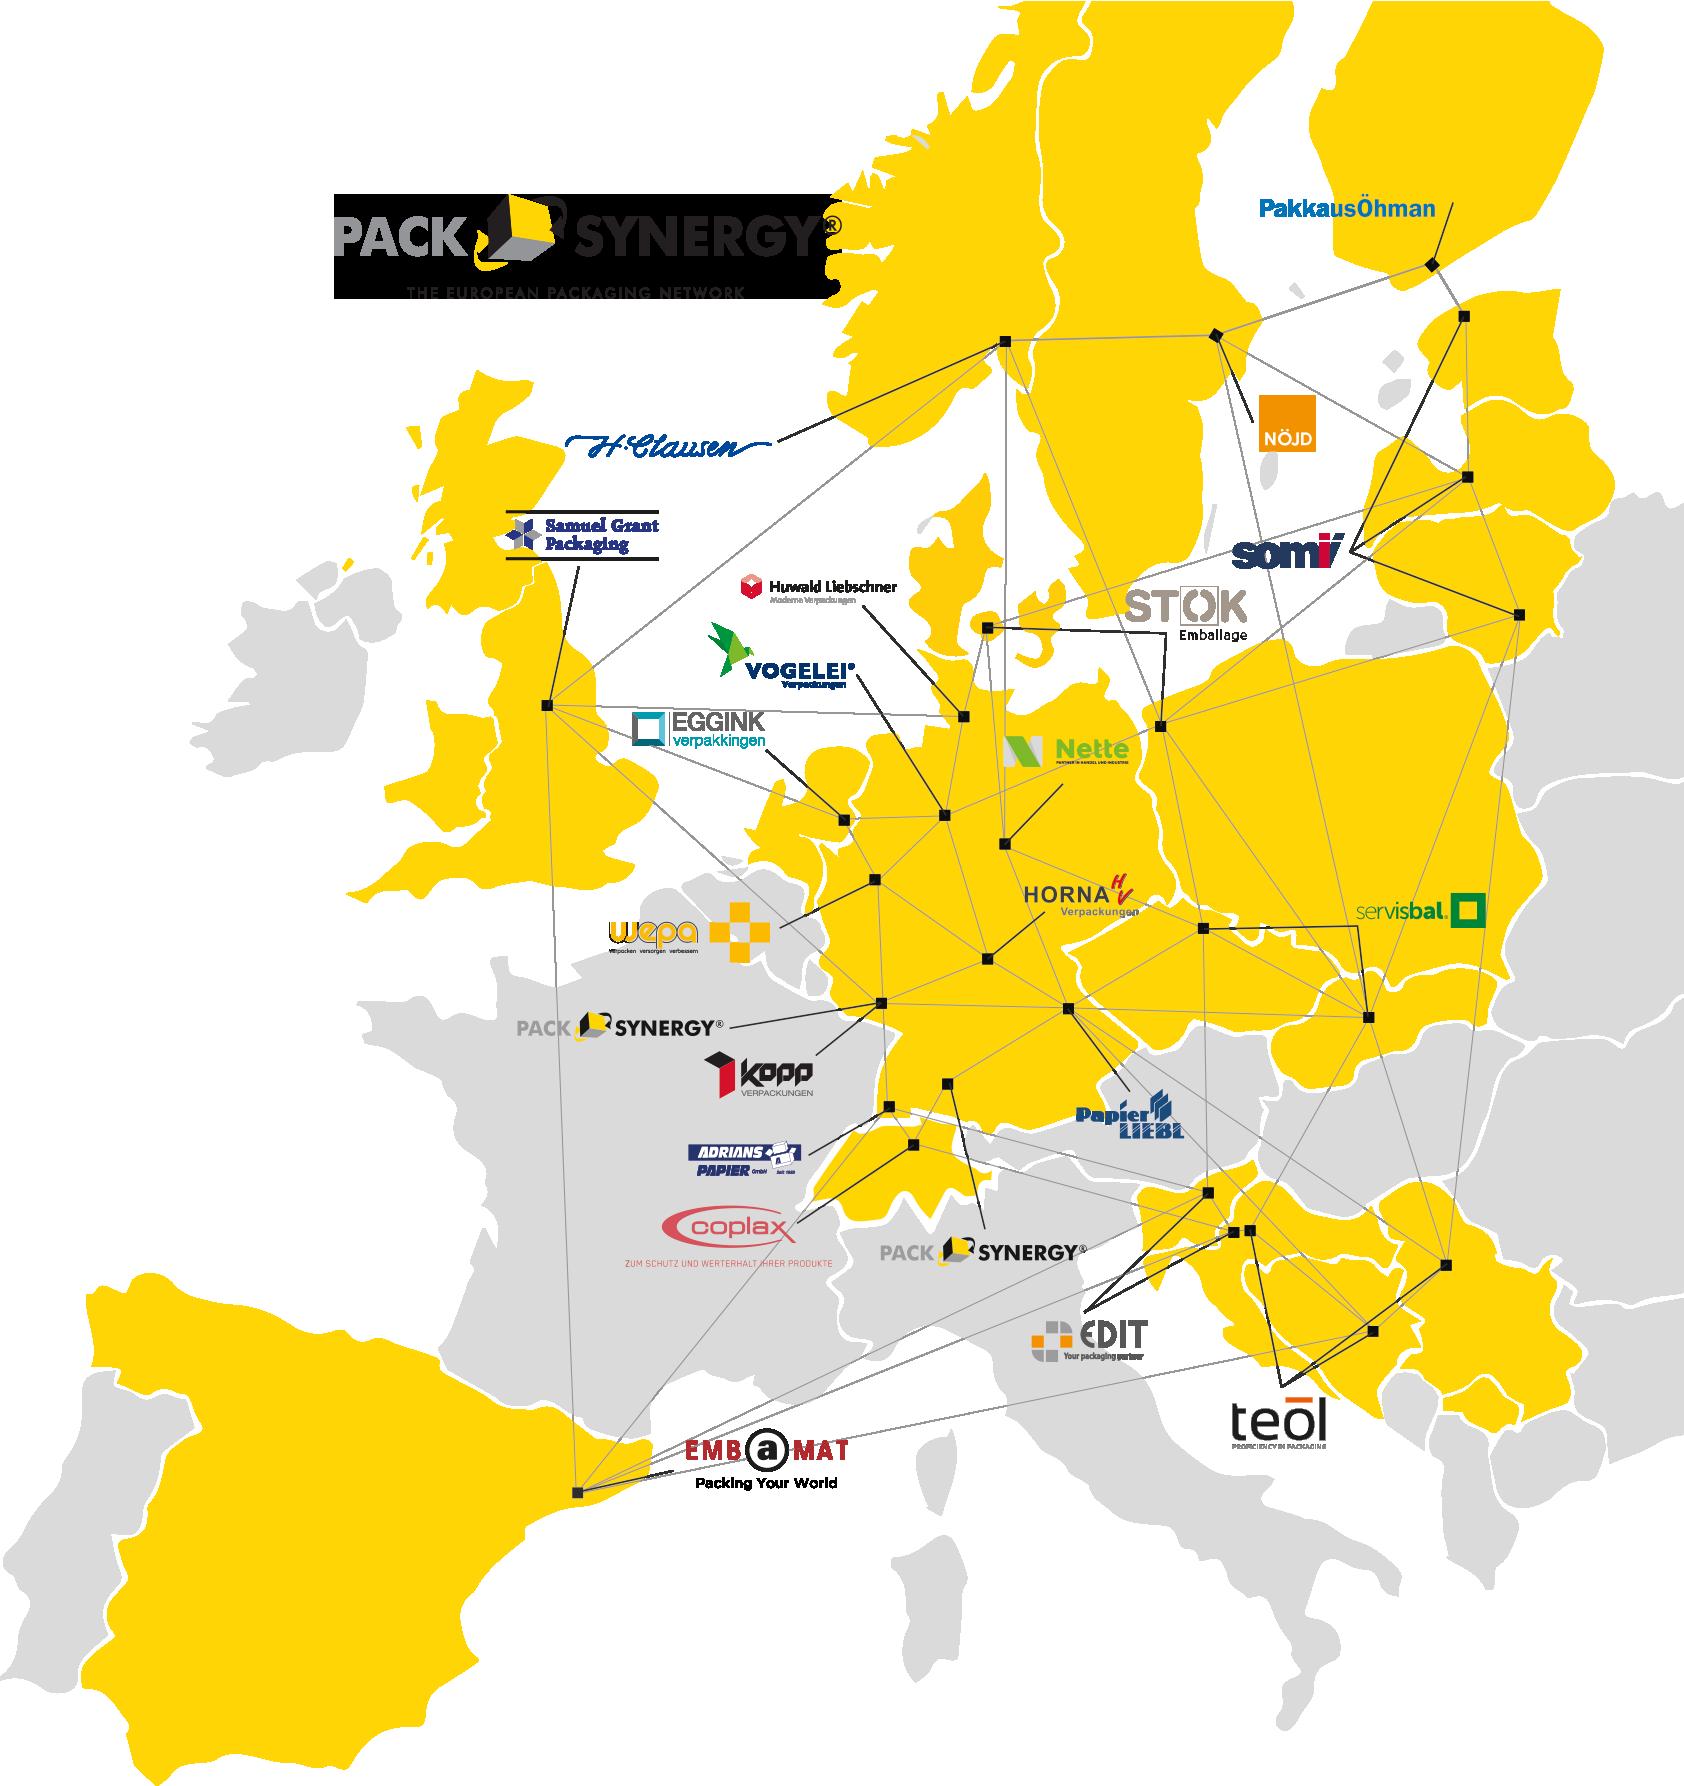 Packsynergy Netzwerk Partnerstandorte